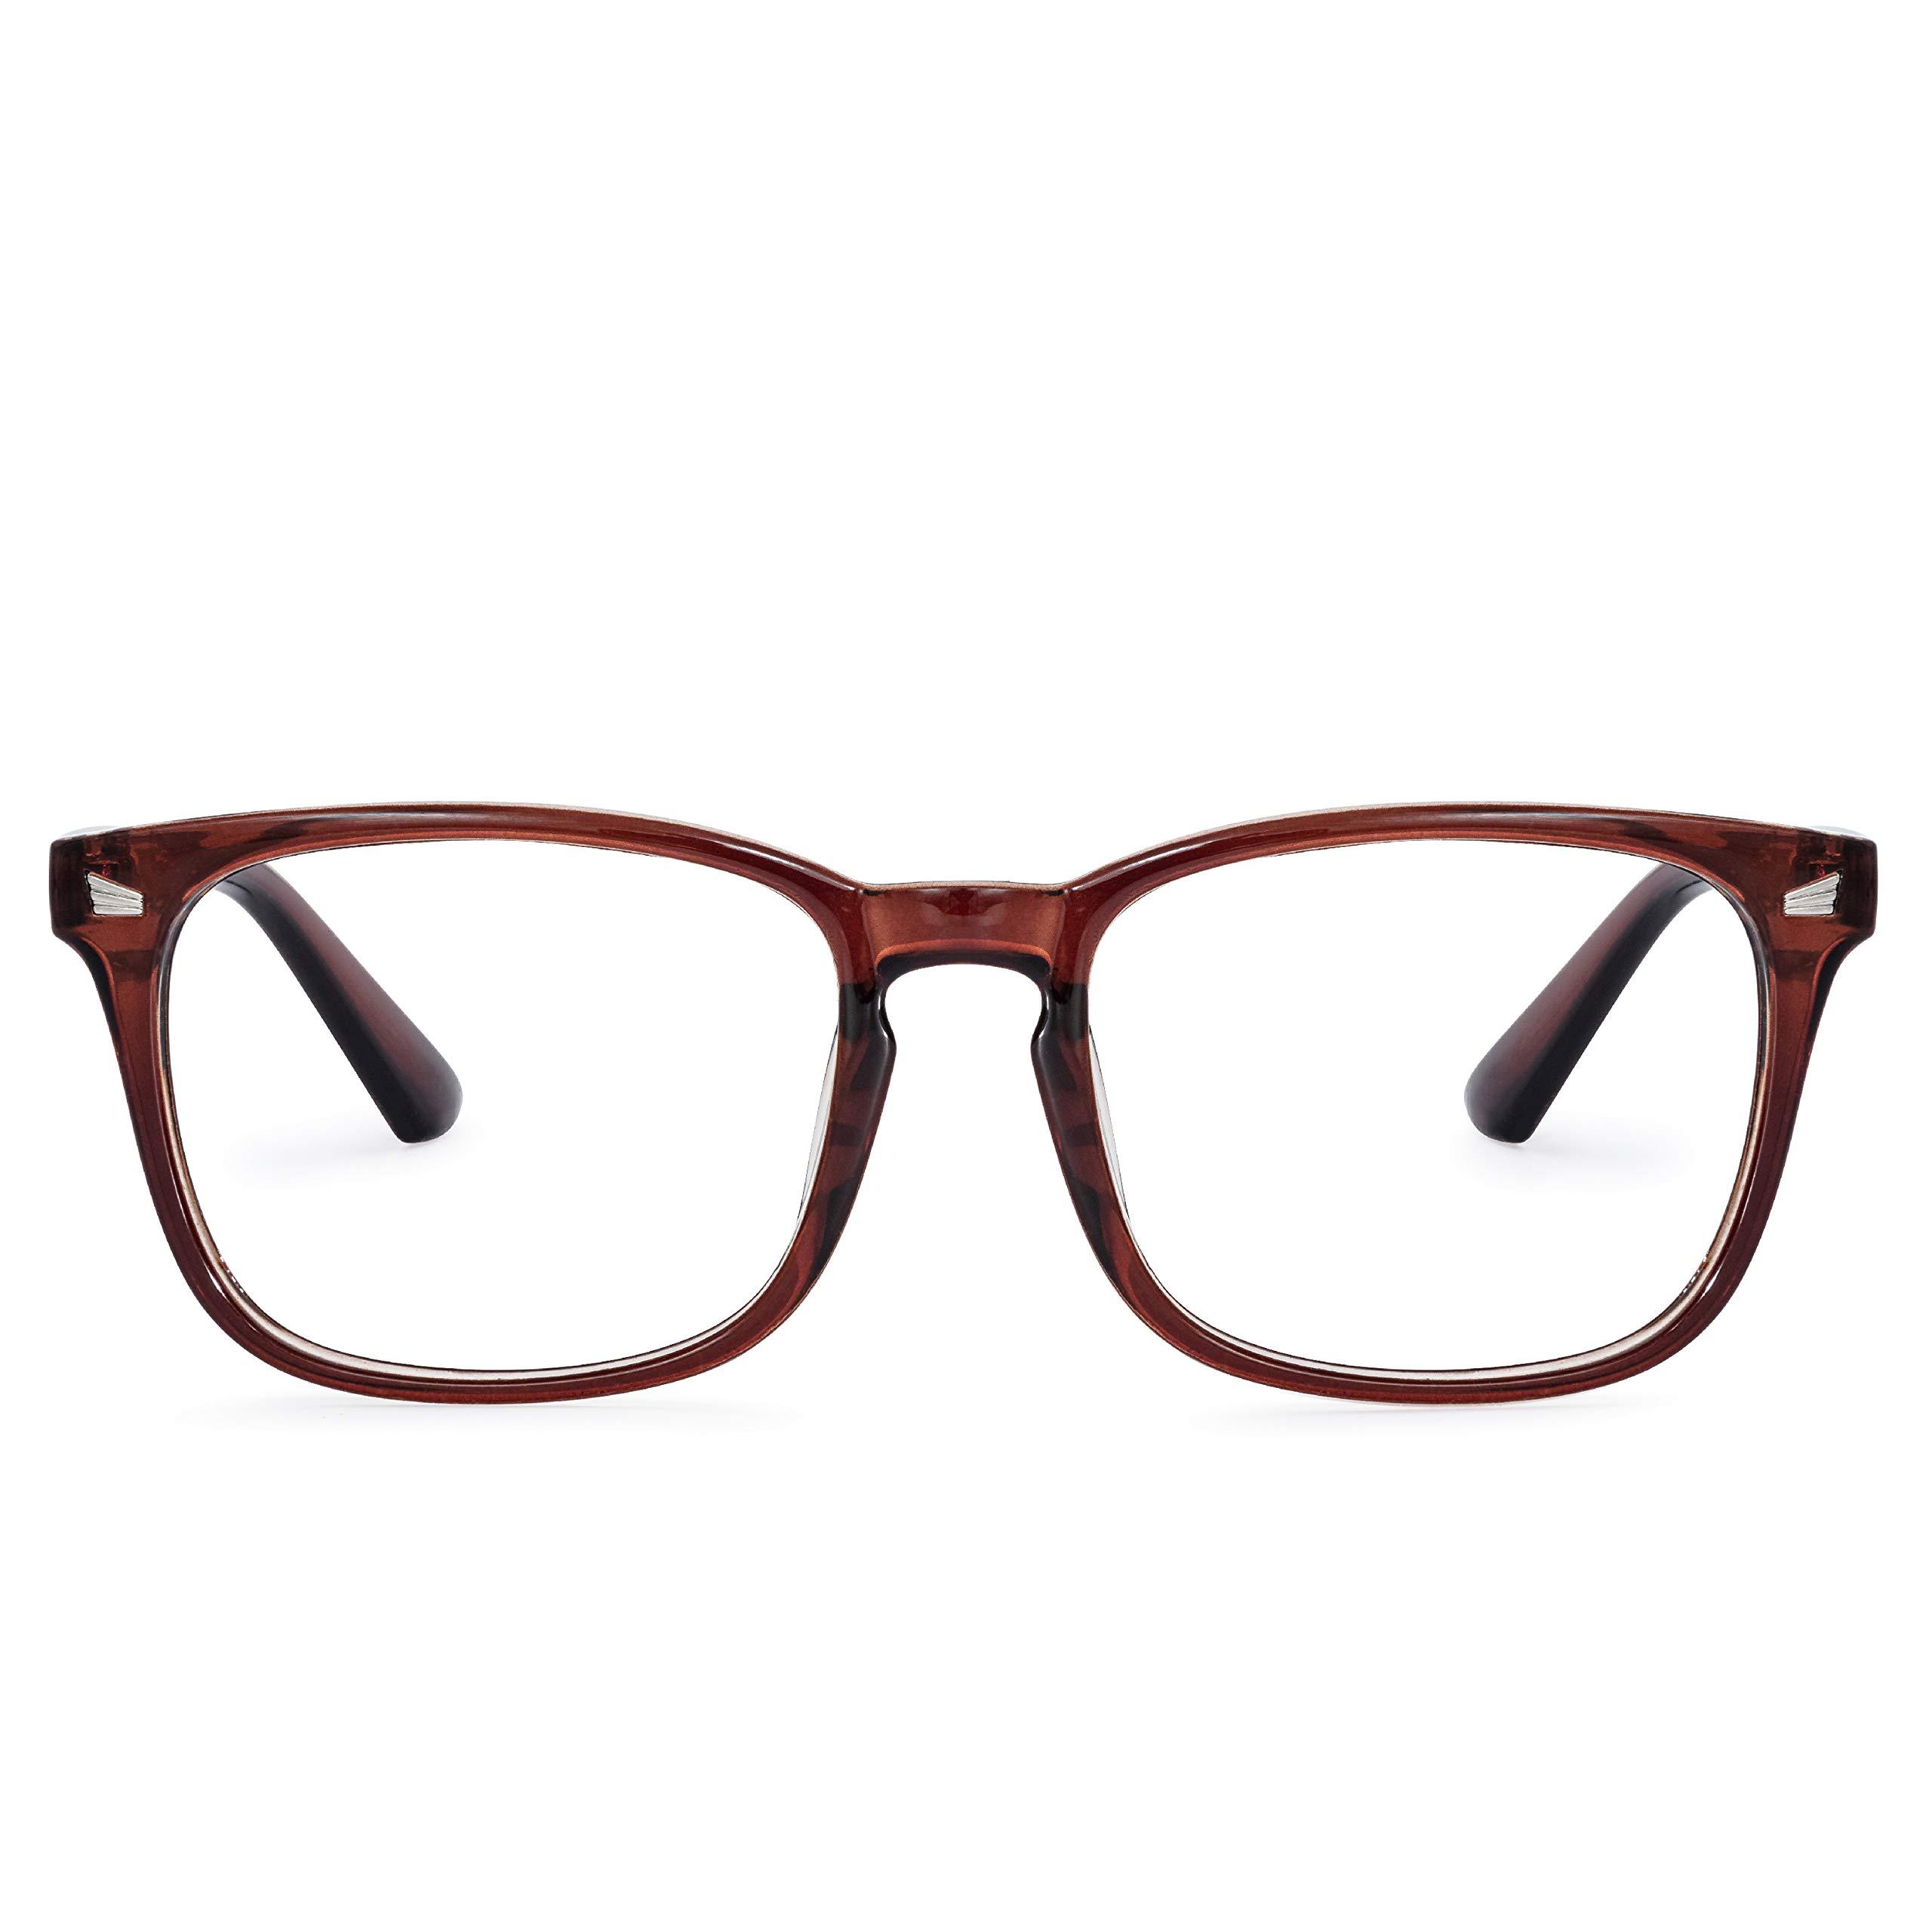 Amazon Com Noel Oscar Blue Light Blocking Glasses For Computer Use Anti Eye Strain Uv Filter Lens Lightweight Eyeglasses Men Women Tea Brown Computers Accessories